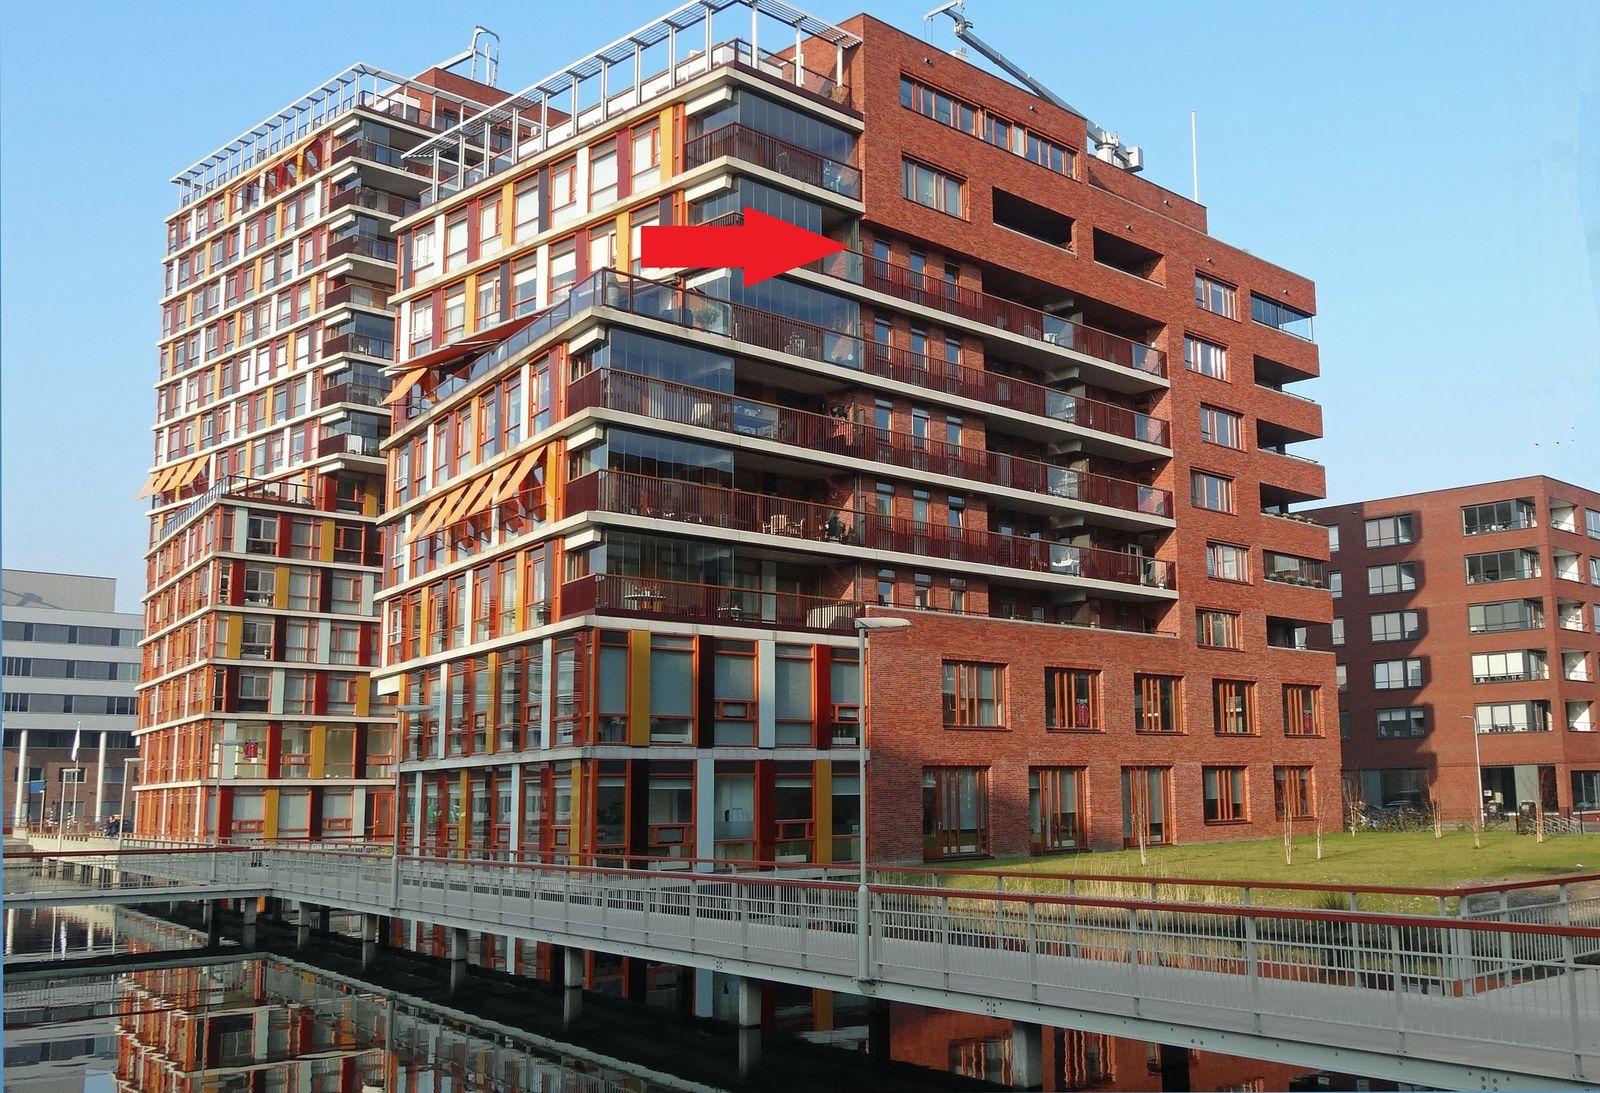 Ronsseweg, Gouda